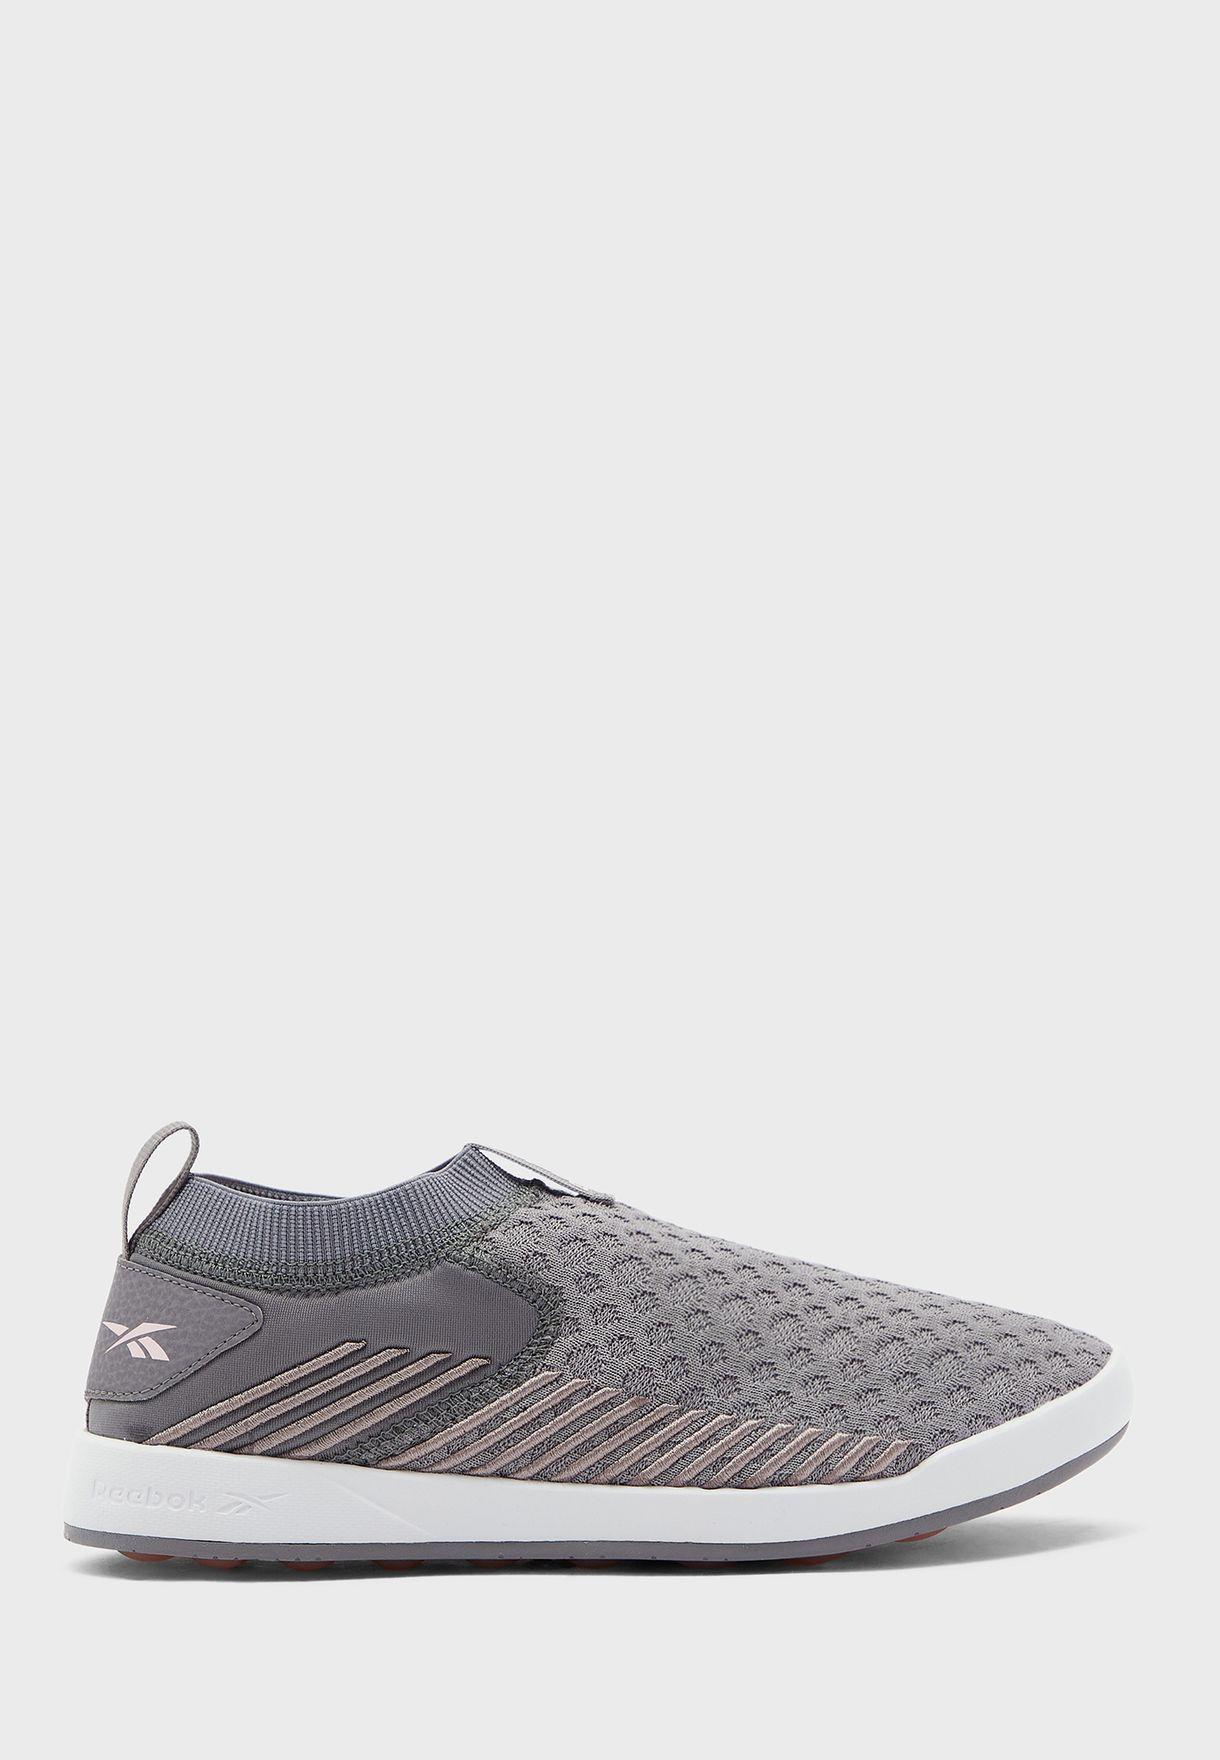 Ever Road Dmx Athletic Sports Women's SlipOn Shoes